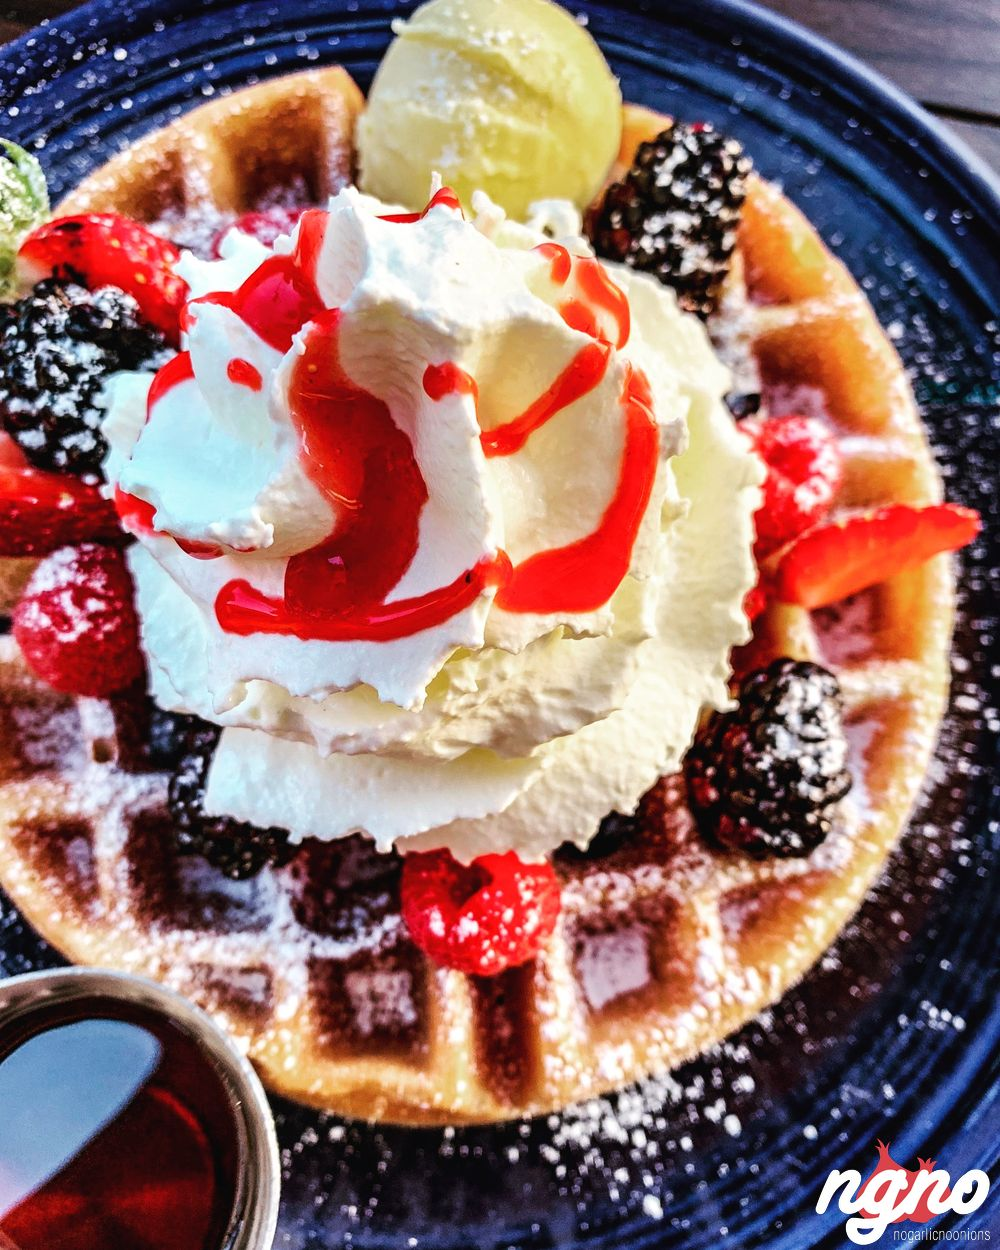 eight-am-san-francisco-breakfast-nogarlicnoonions-12018-10-22-07-52-43